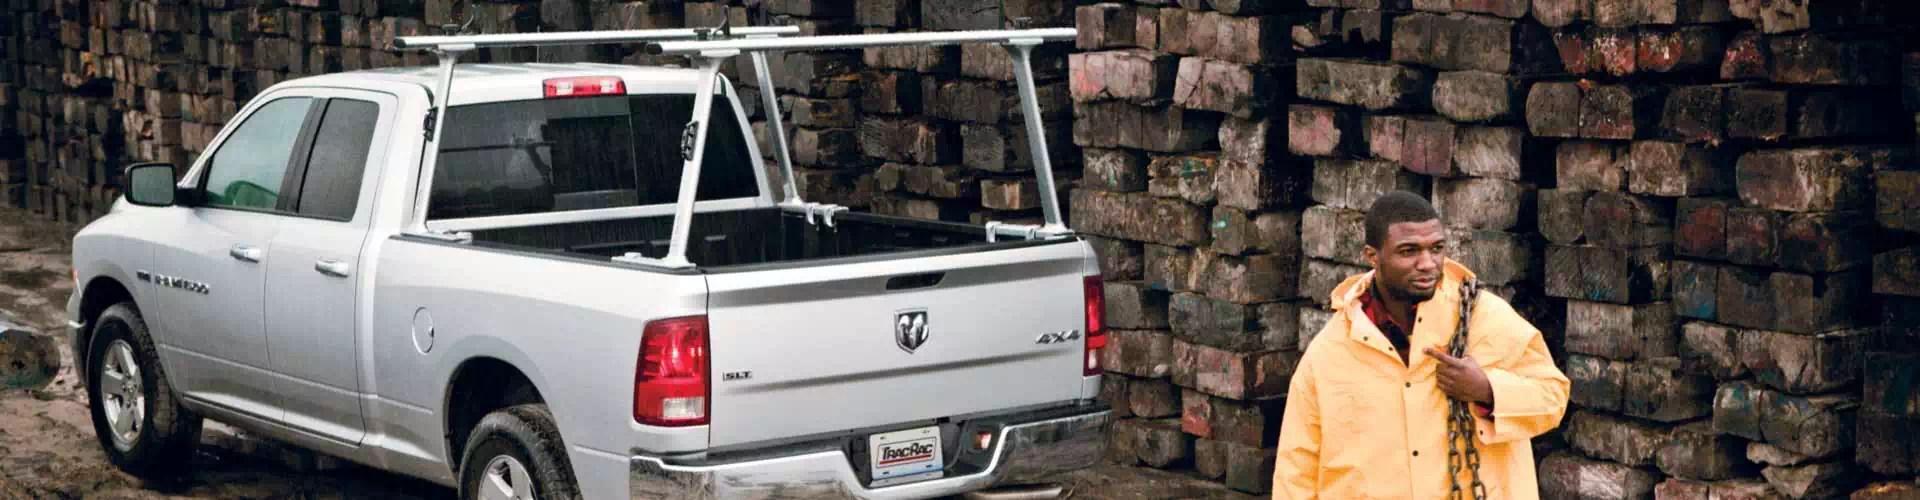 thule tracrac truck racks